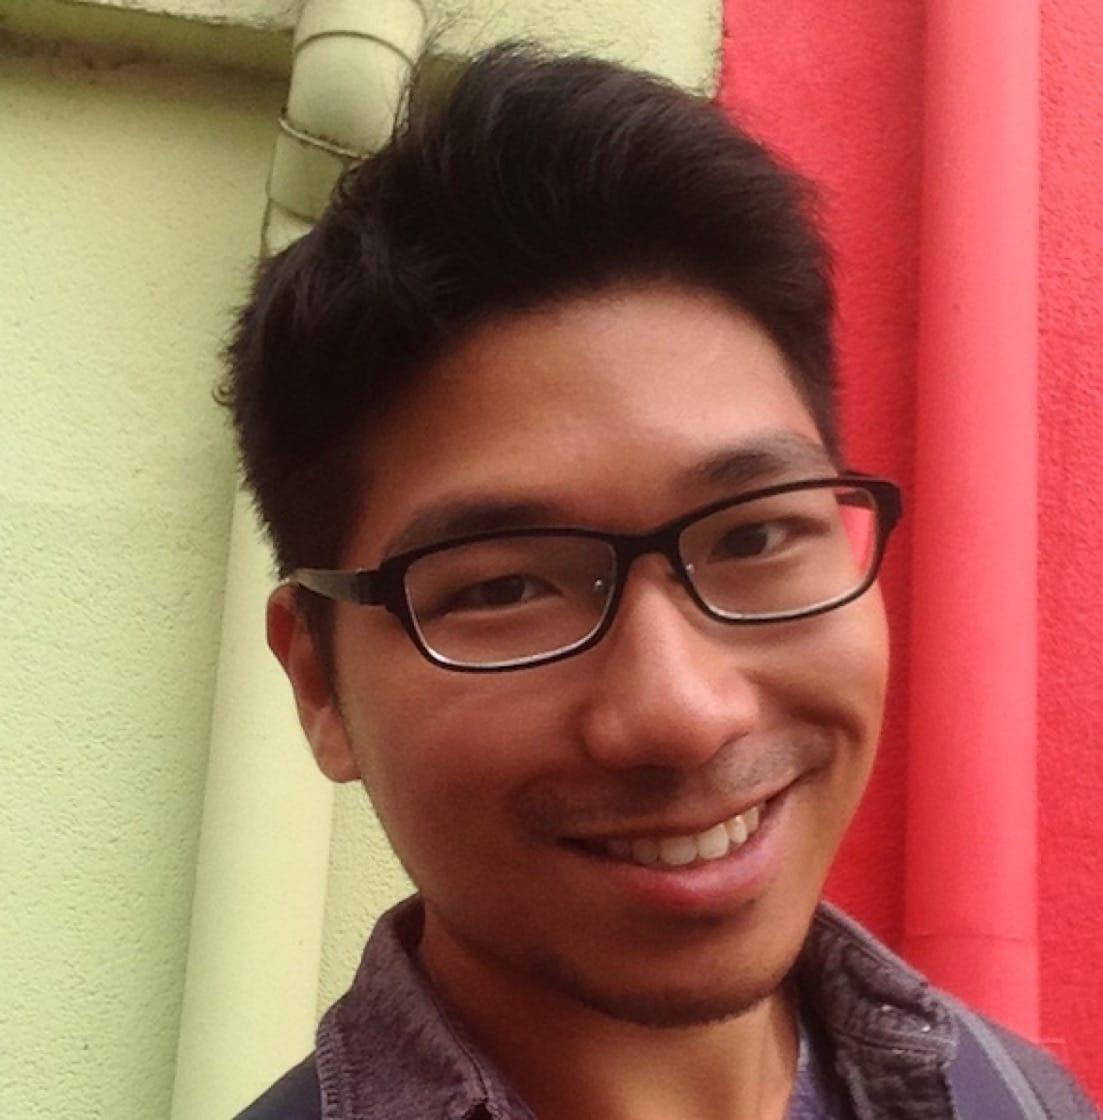 Vincent Leung